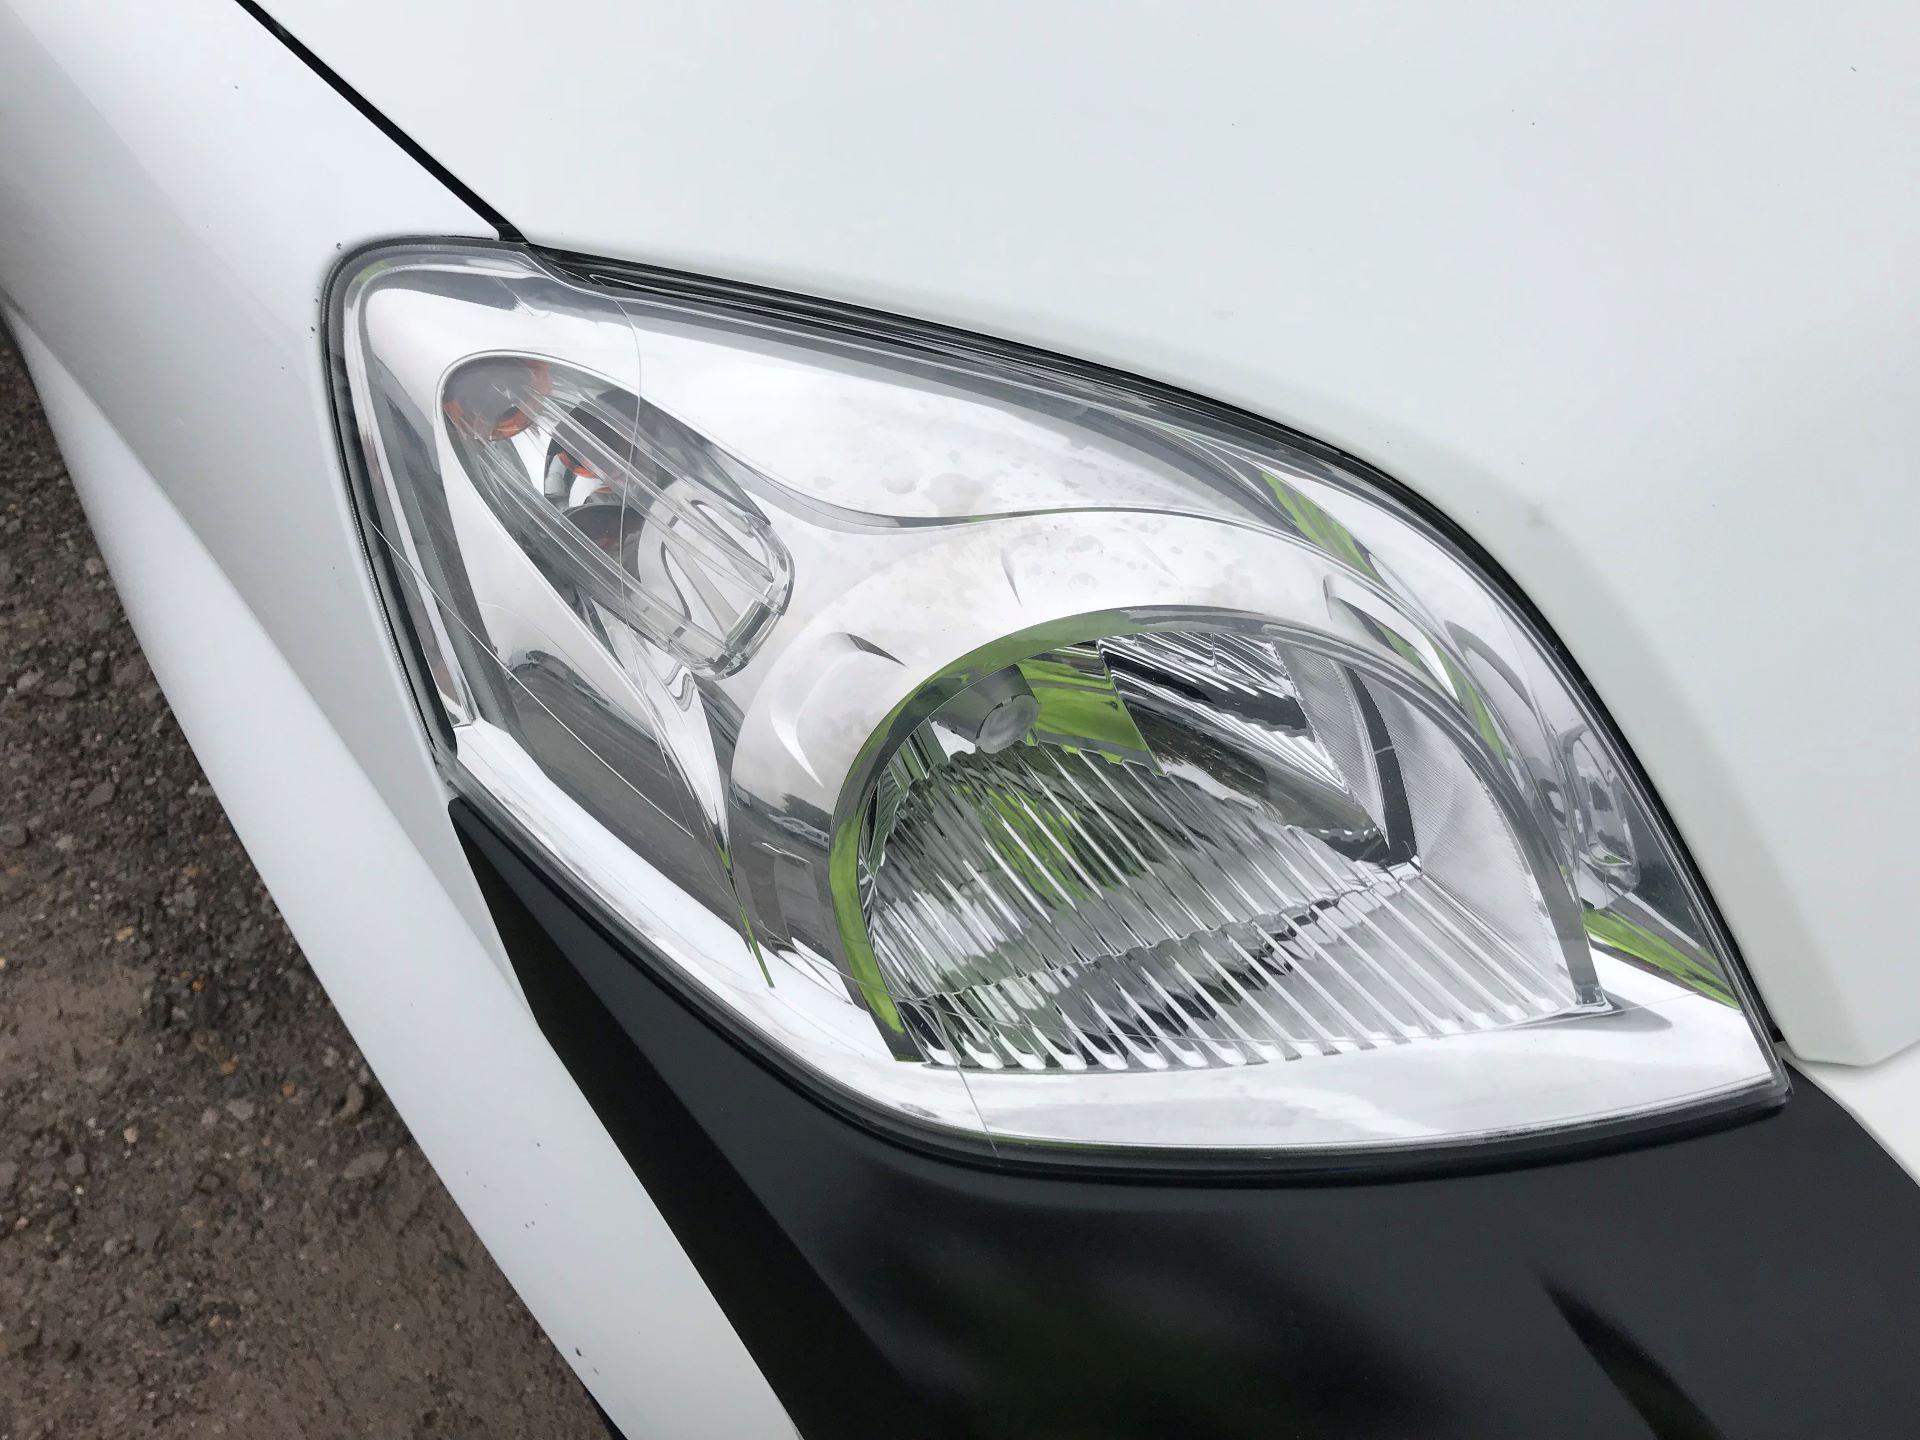 2016 Peugeot Bipper 1.3 HDI 75 S PLUS PACK NON S/S EURO 5 (NU16DLJ) Image 29